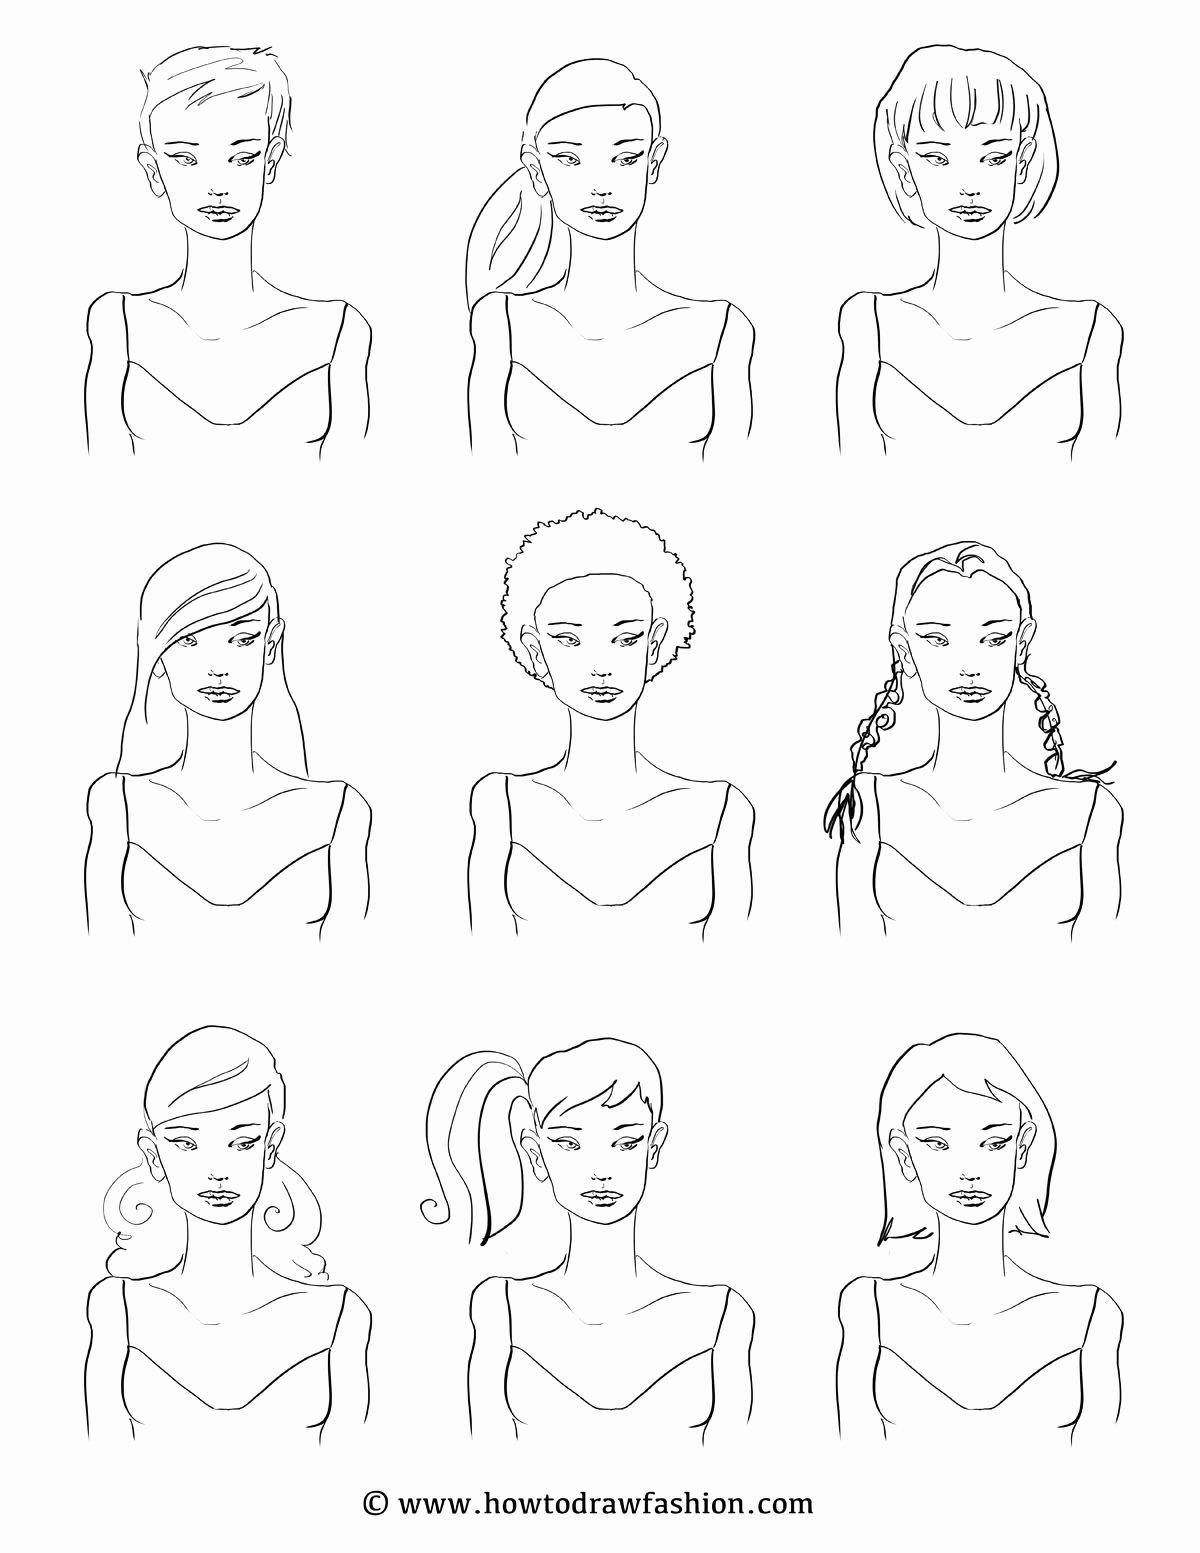 Blank Model Sketch Template Elegant How to Draw Fashion E Model Nine Styles